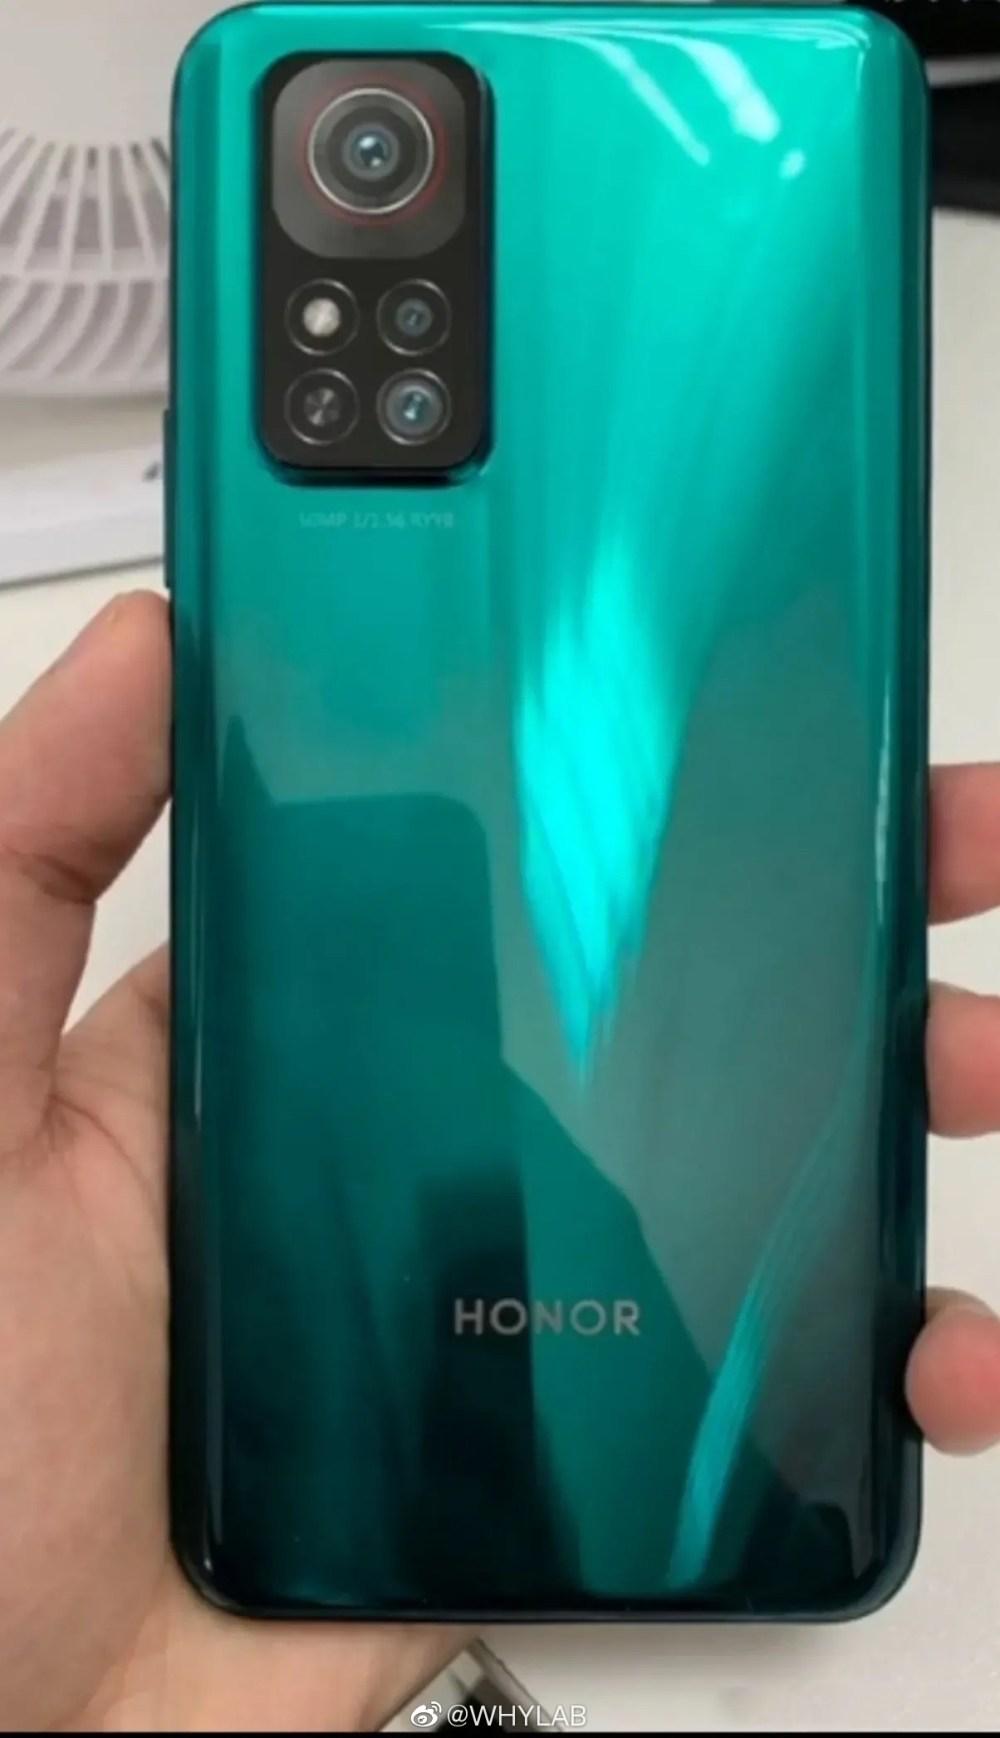 Honor V40 5G rear camera leak